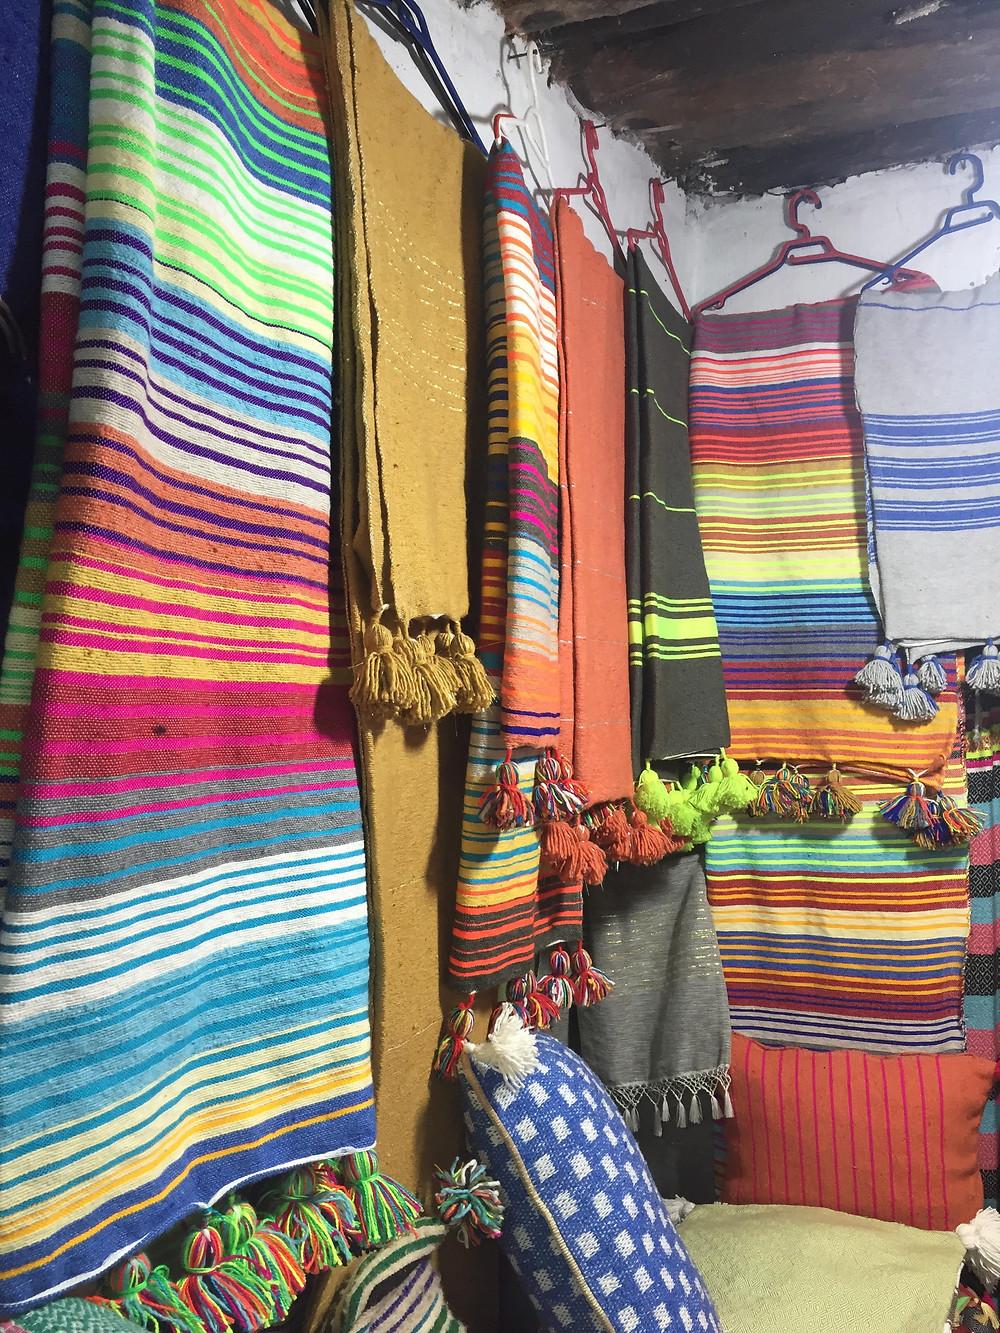 Morocco, Essaouira, weaving, loom, blanket, tapestry